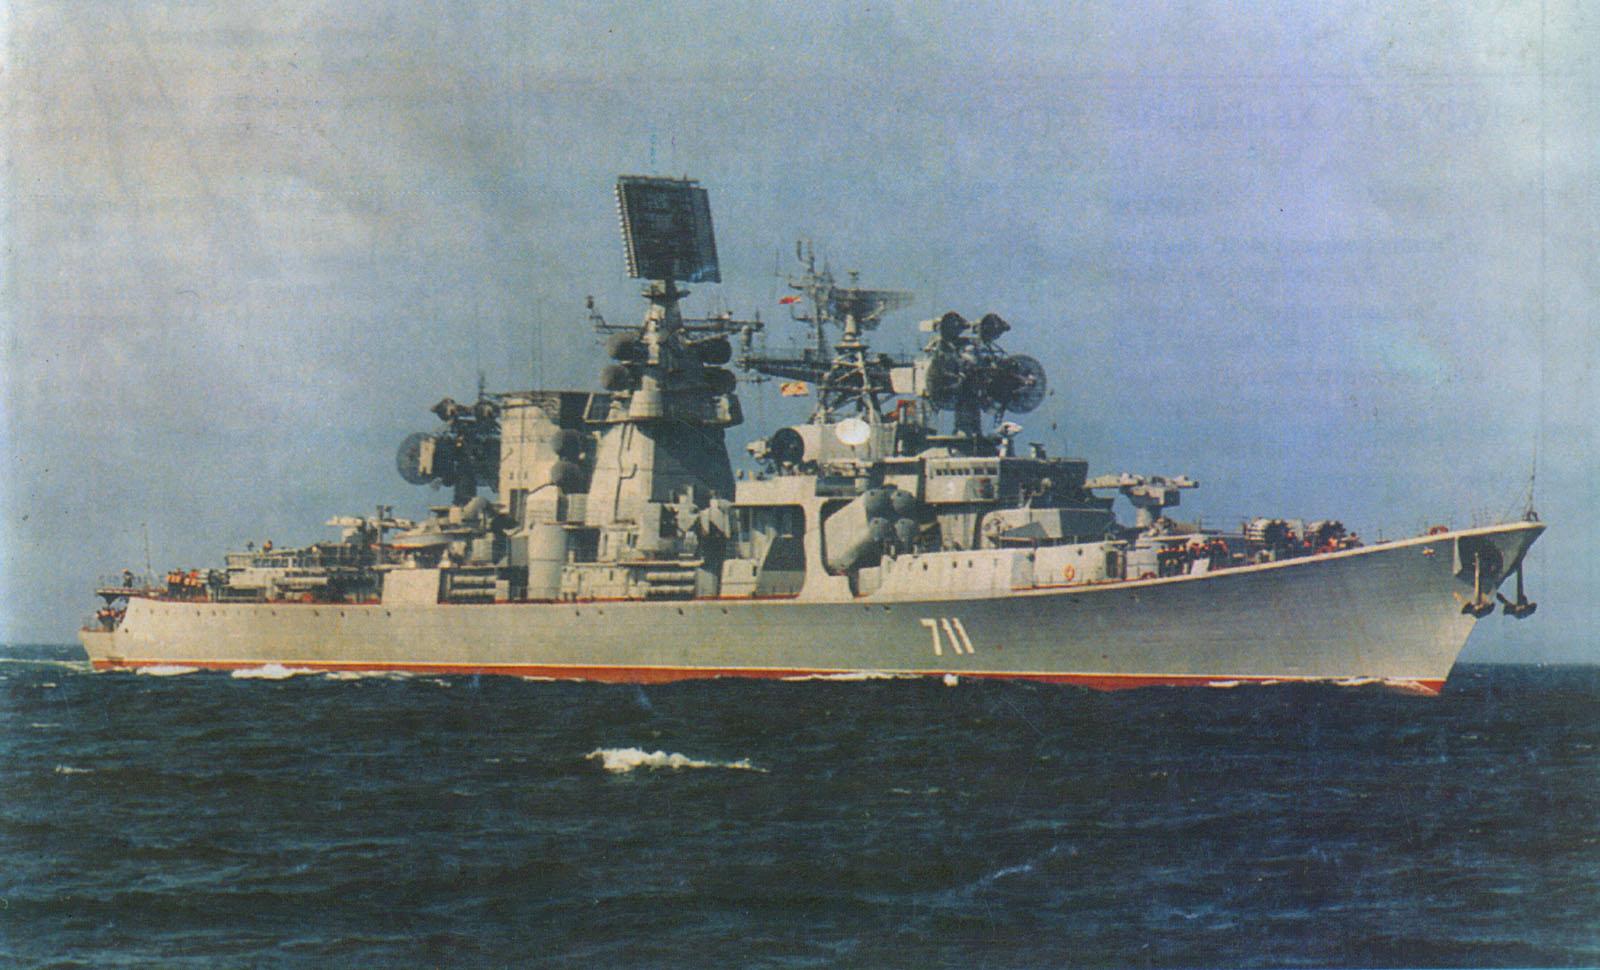 http://navsource.narod.ru/photos/02/206/02206012.jpg